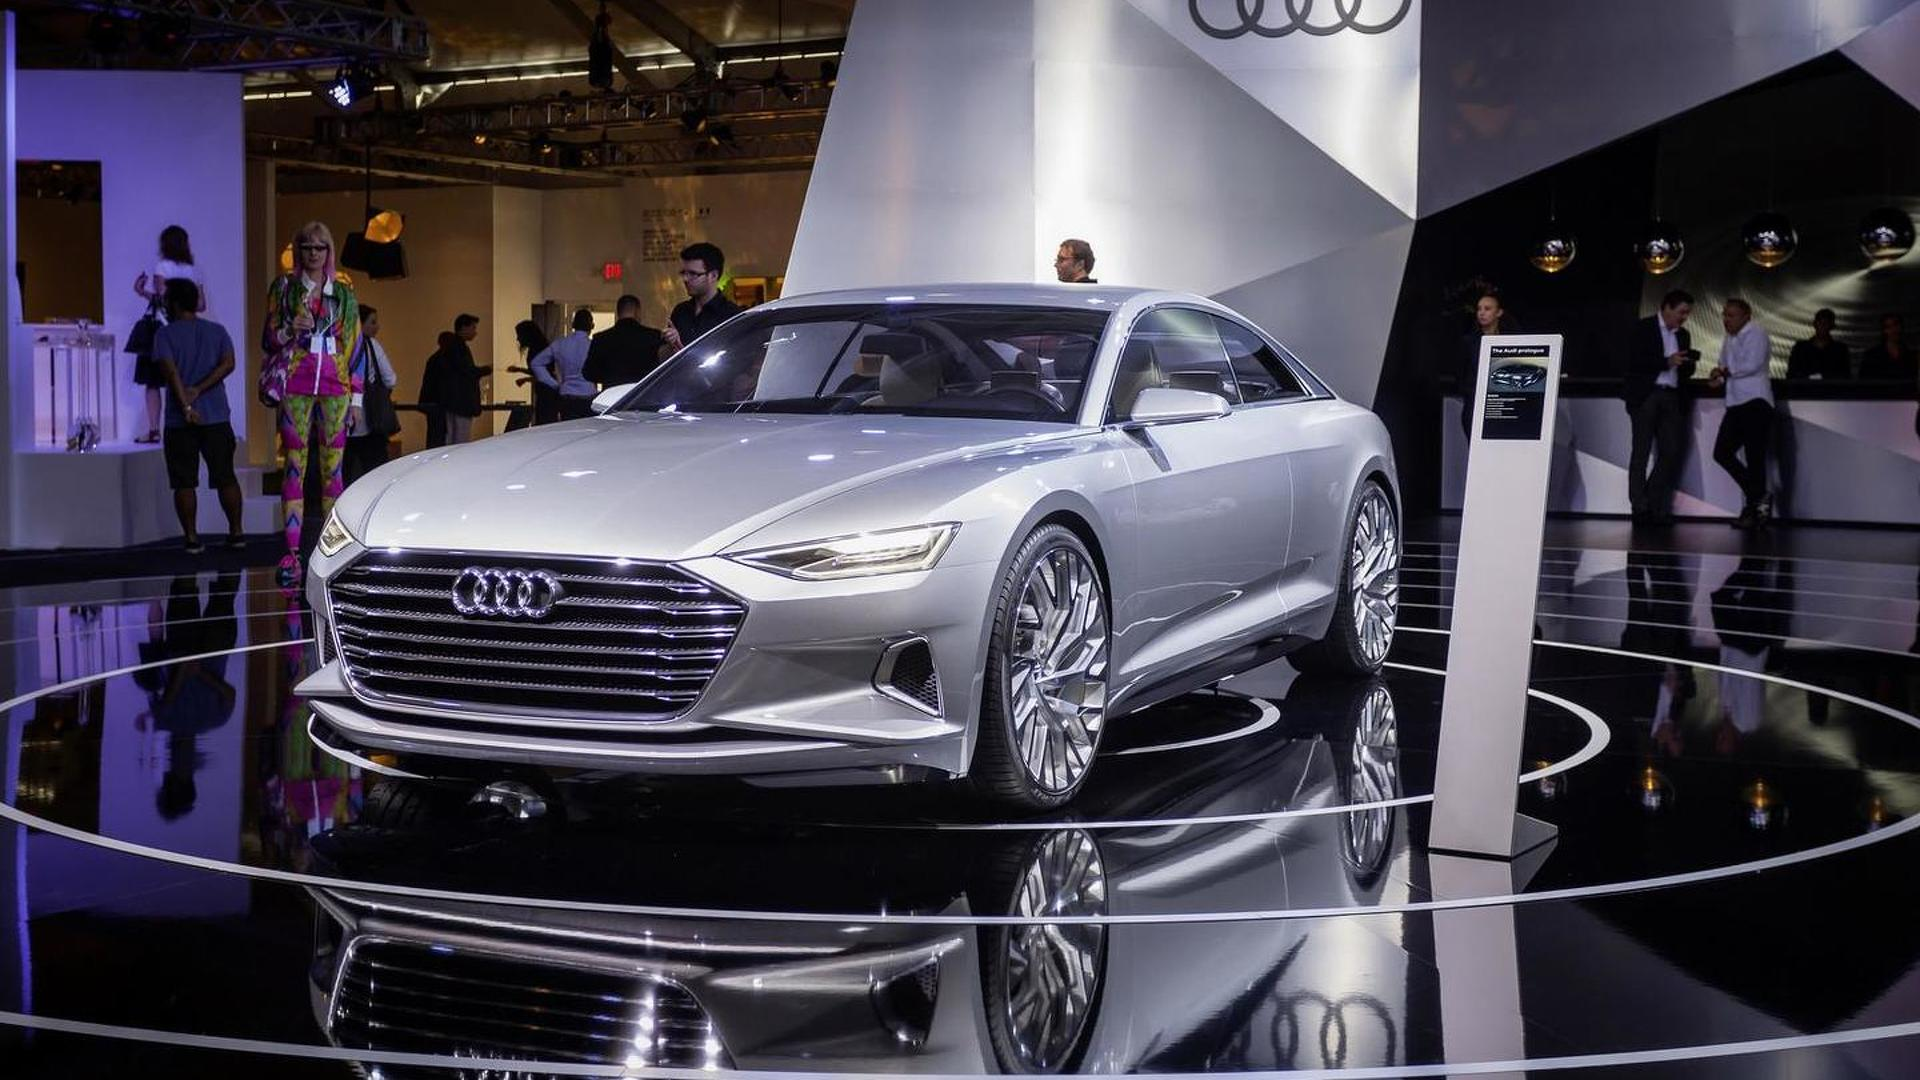 Audi Prologue concept shows up at Design Miami